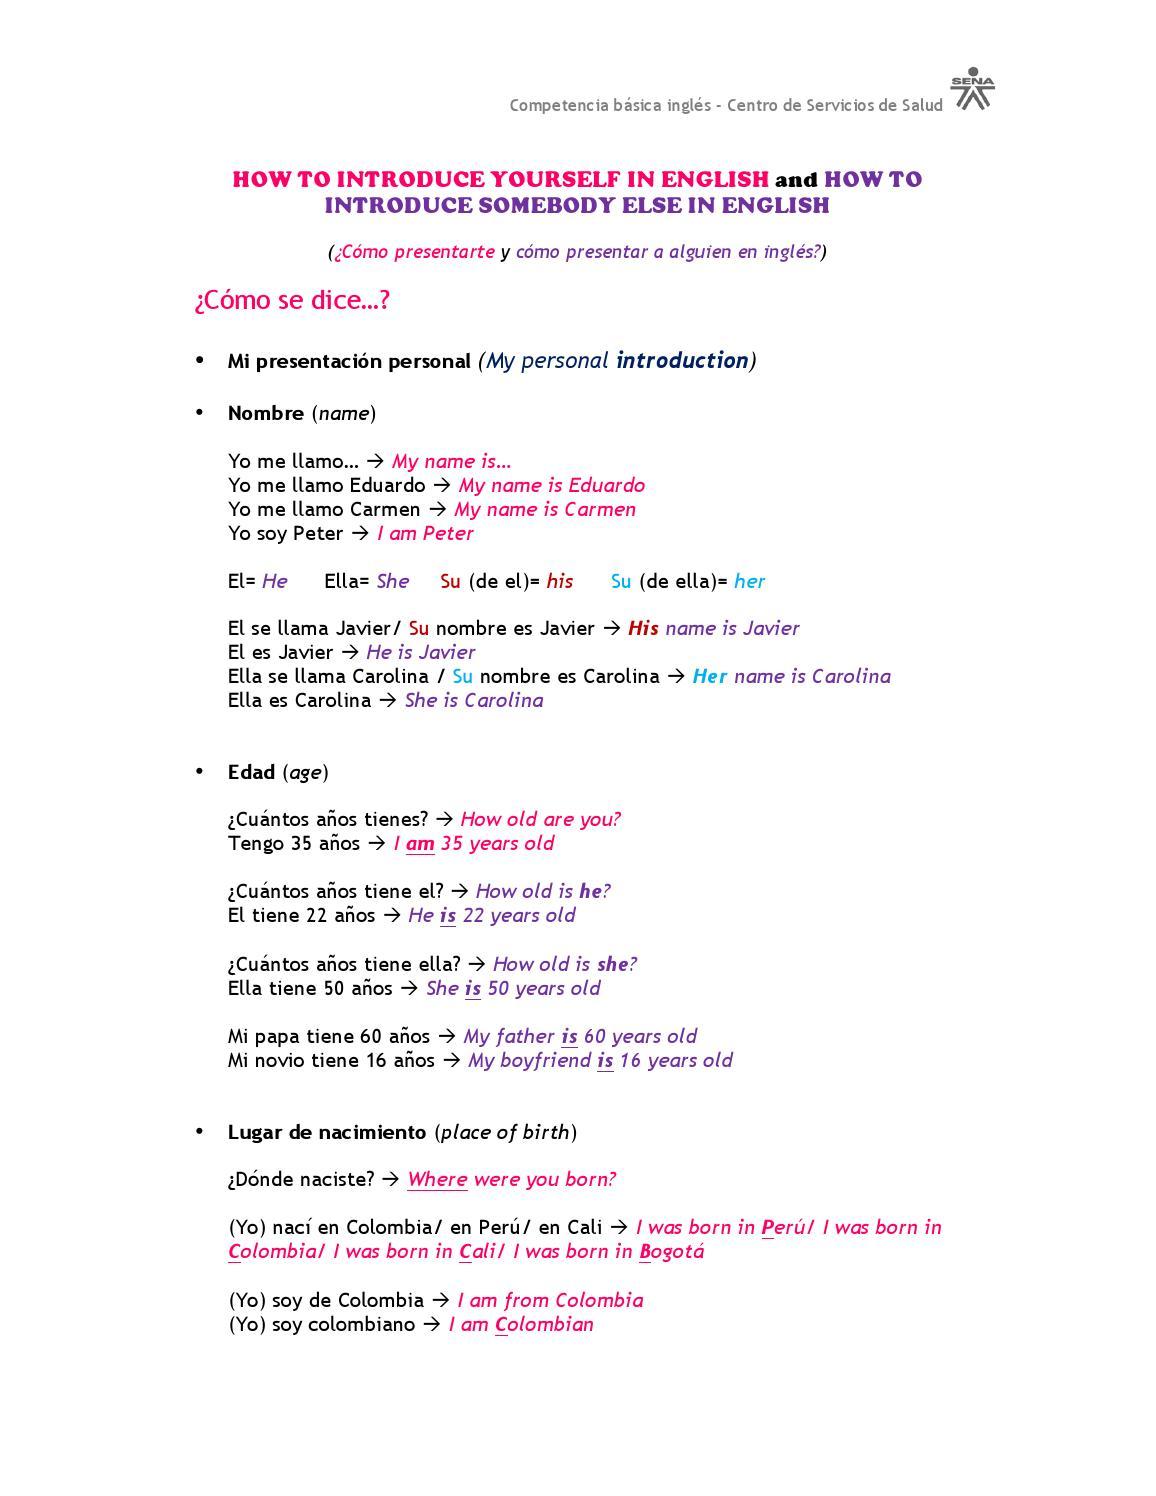 Irregular past tense verbs ks1